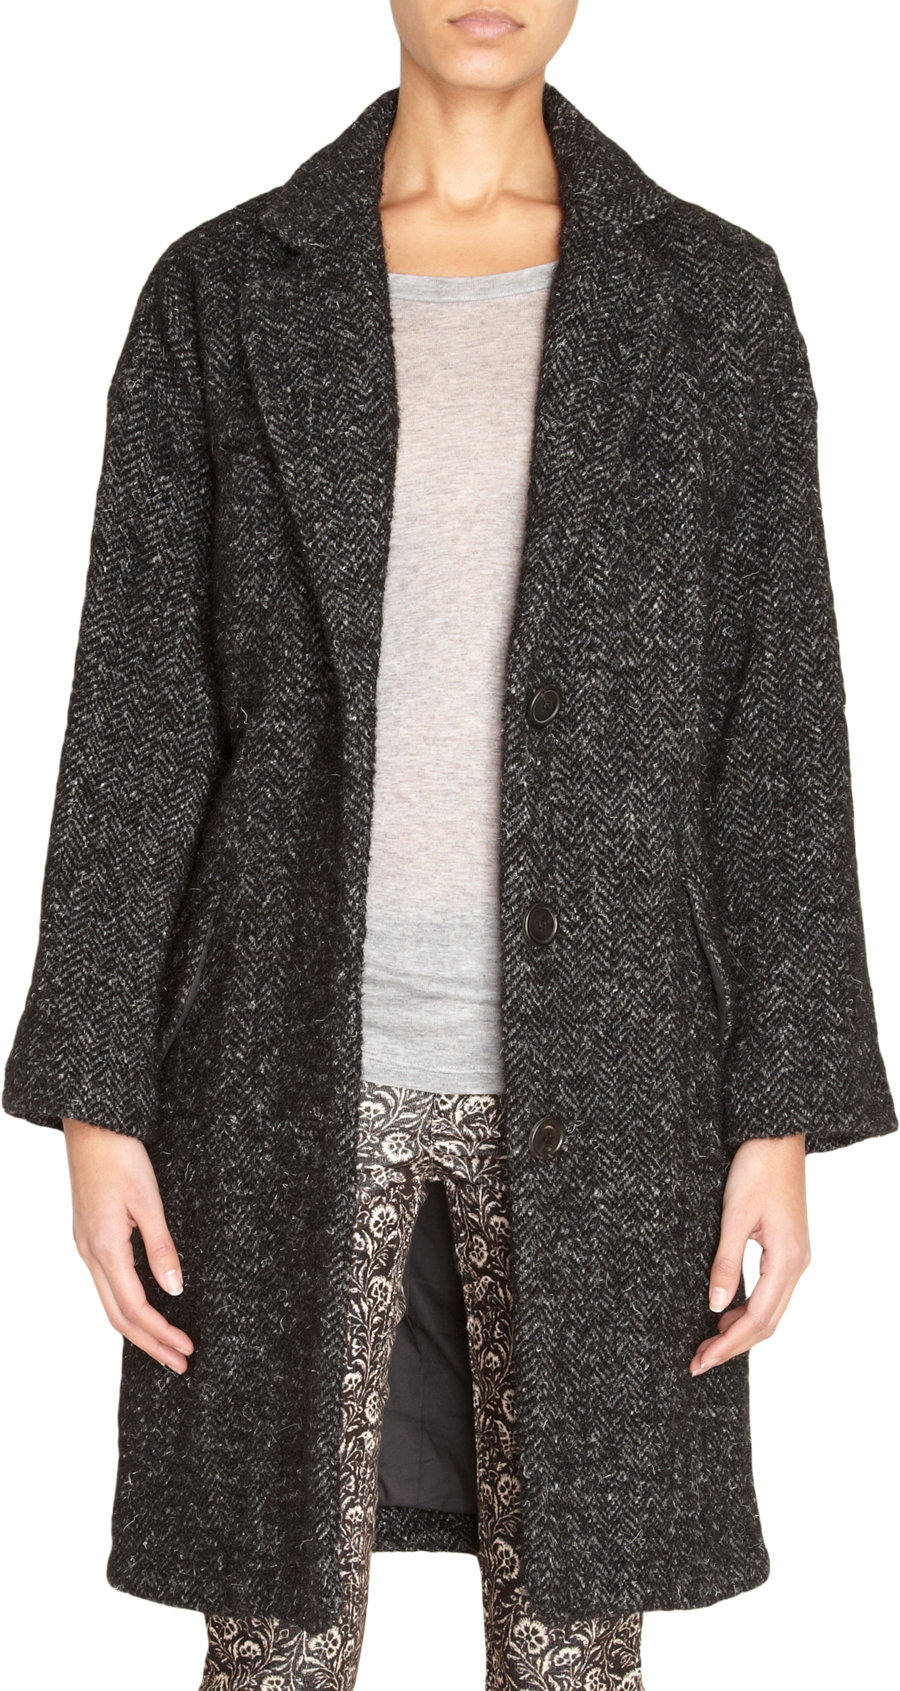 Étoile isabel marant Delphe Coat in Black | Lyst